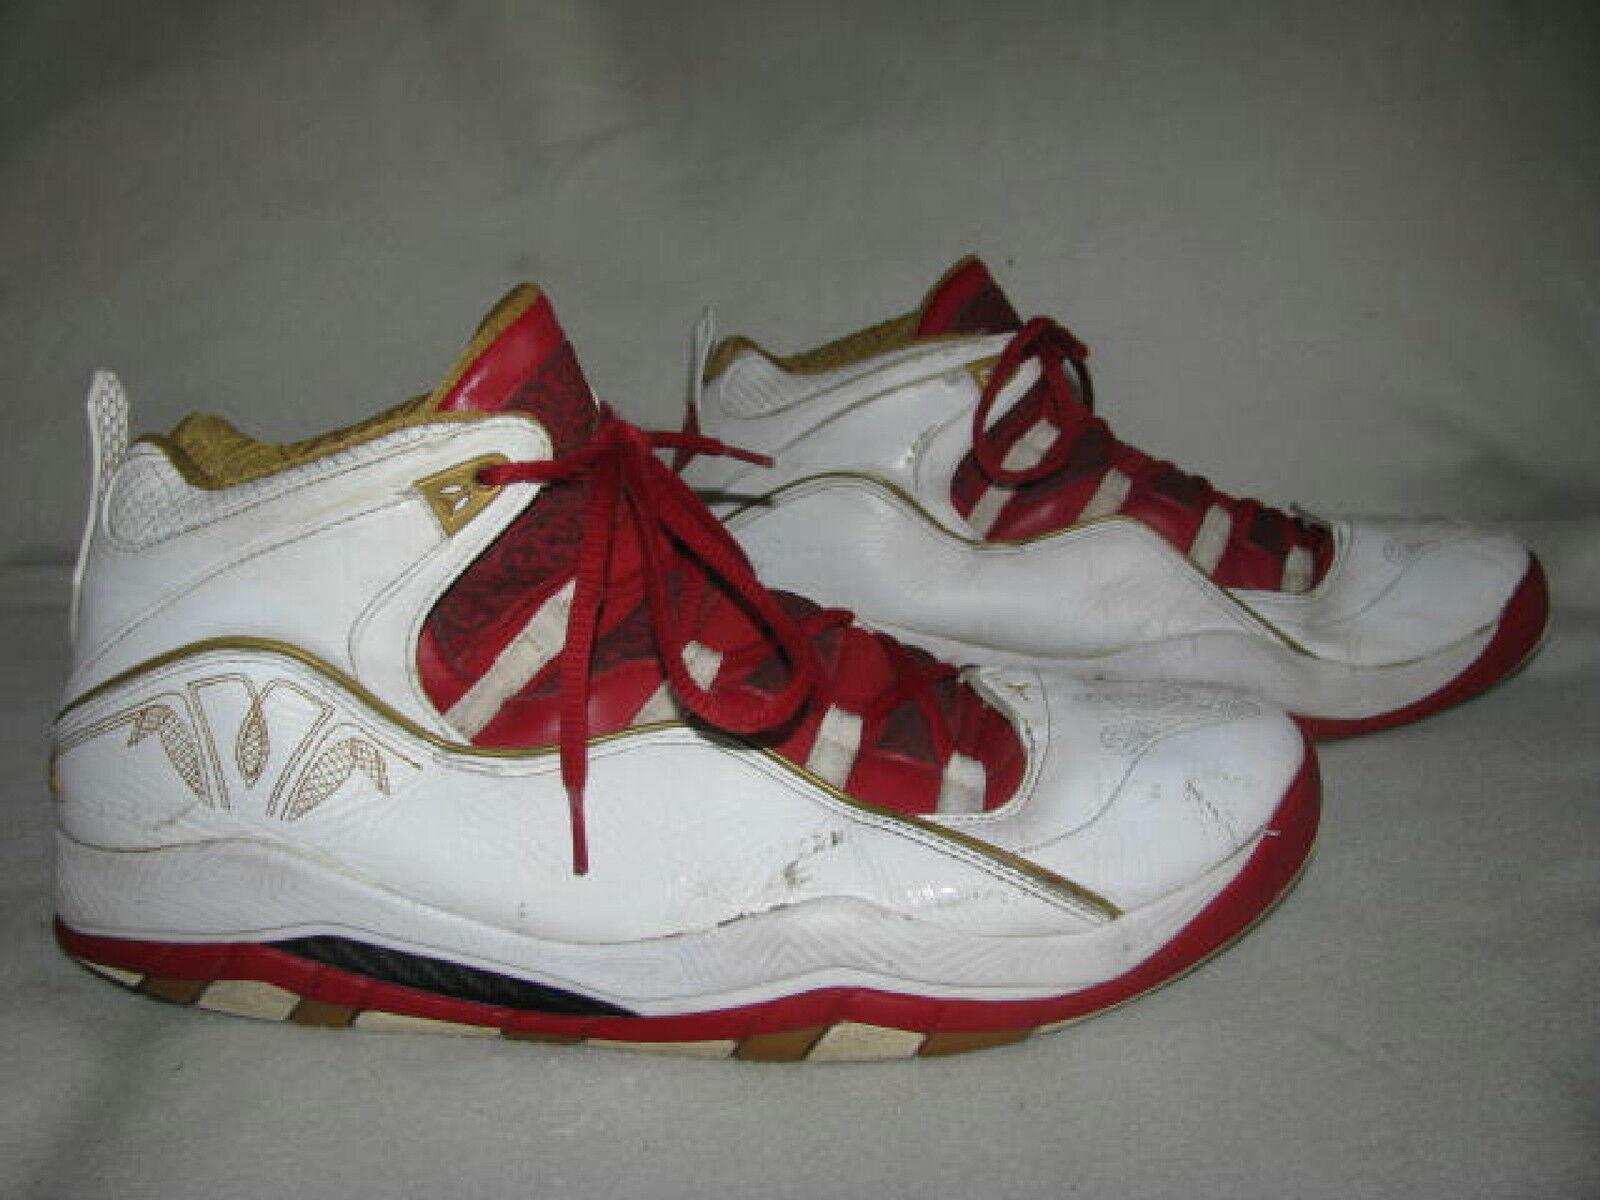 Nike Air JORDAN Olympia 323096-171 Mens Sz 13 White Metallic gold Varsity Red